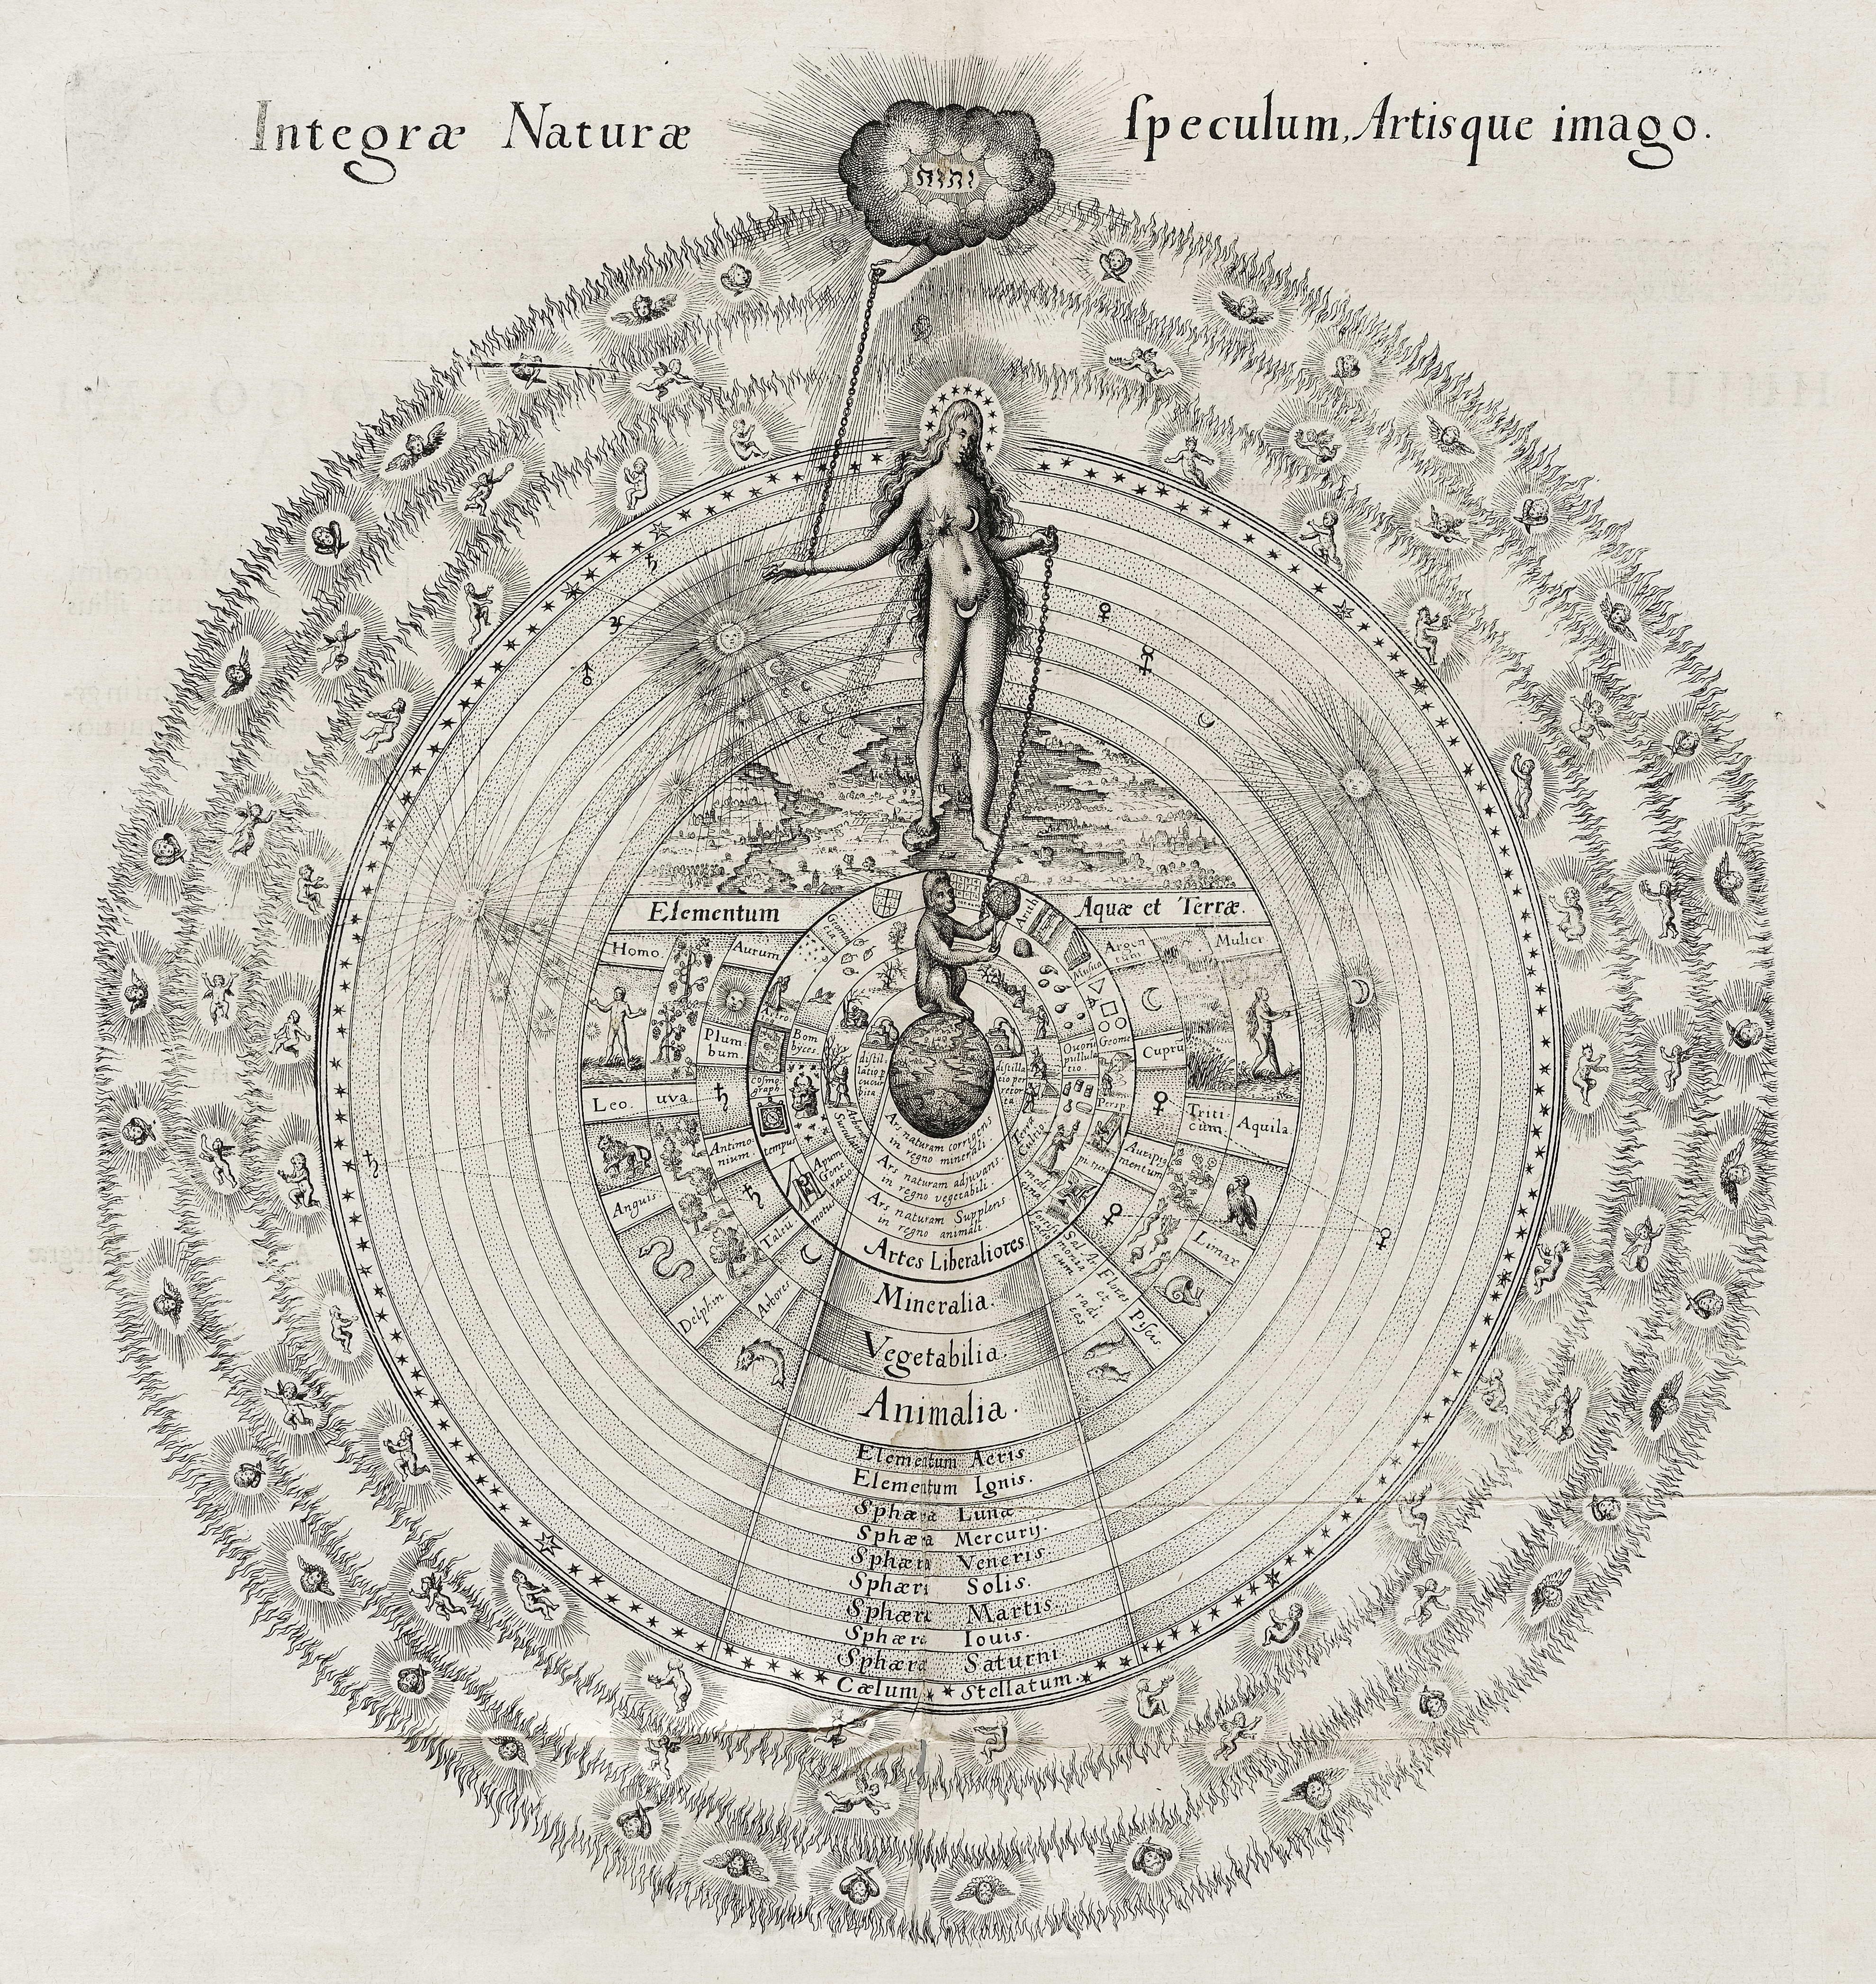 Robert Fludd: Utriusque cosmi. Tomus Primus. De macrocosmi Historia. De Natura simia (Frankfurt 1617)